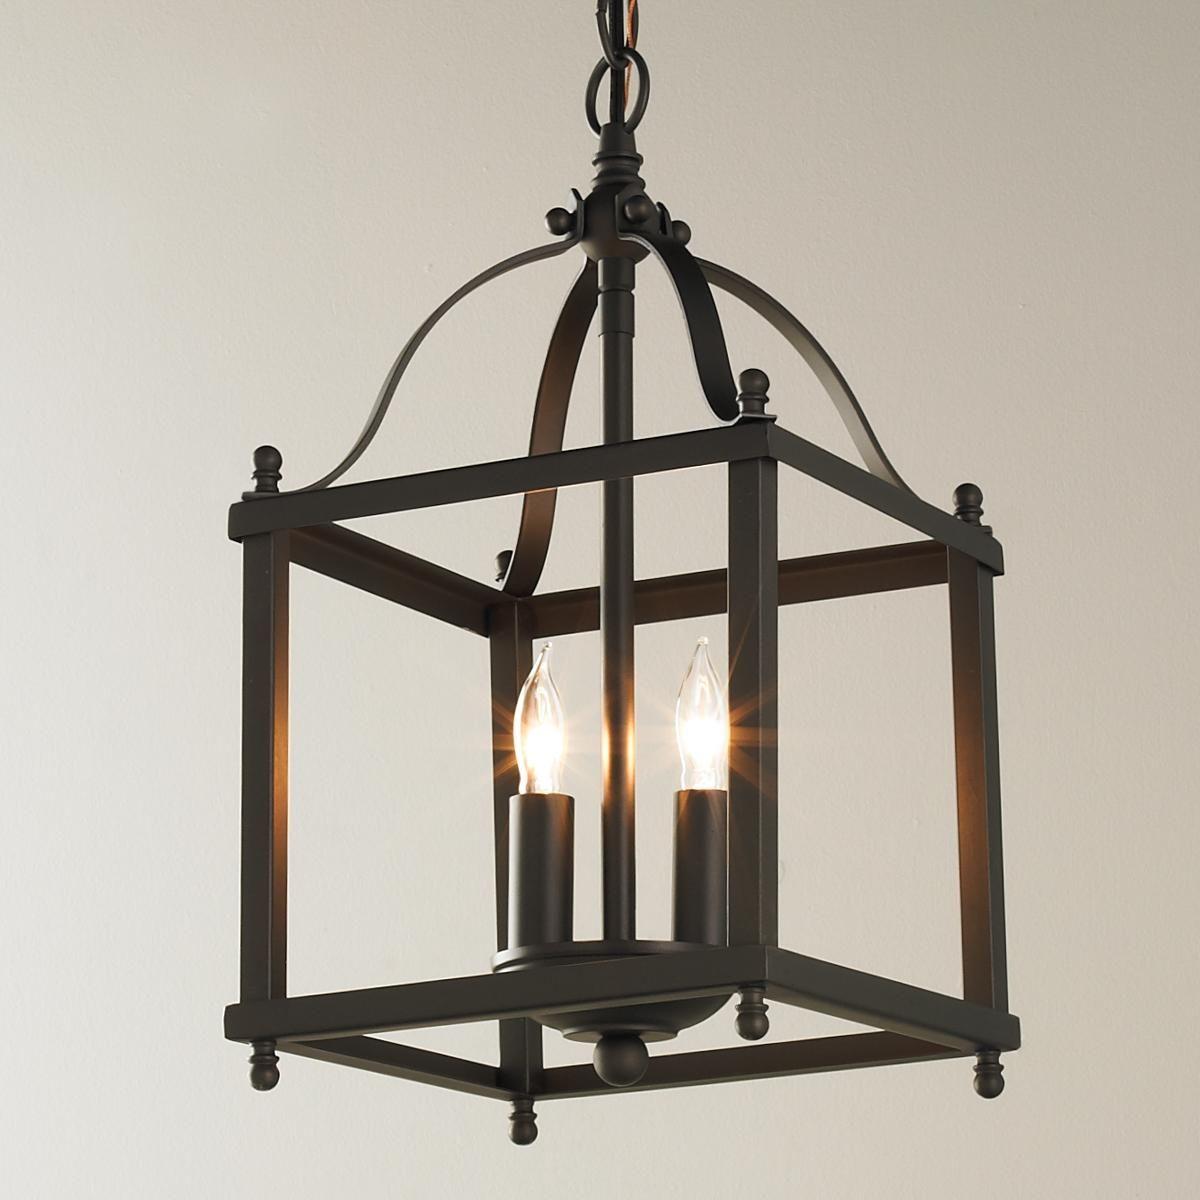 Arched Silhouette Pendant Light Lantern pendant lighting